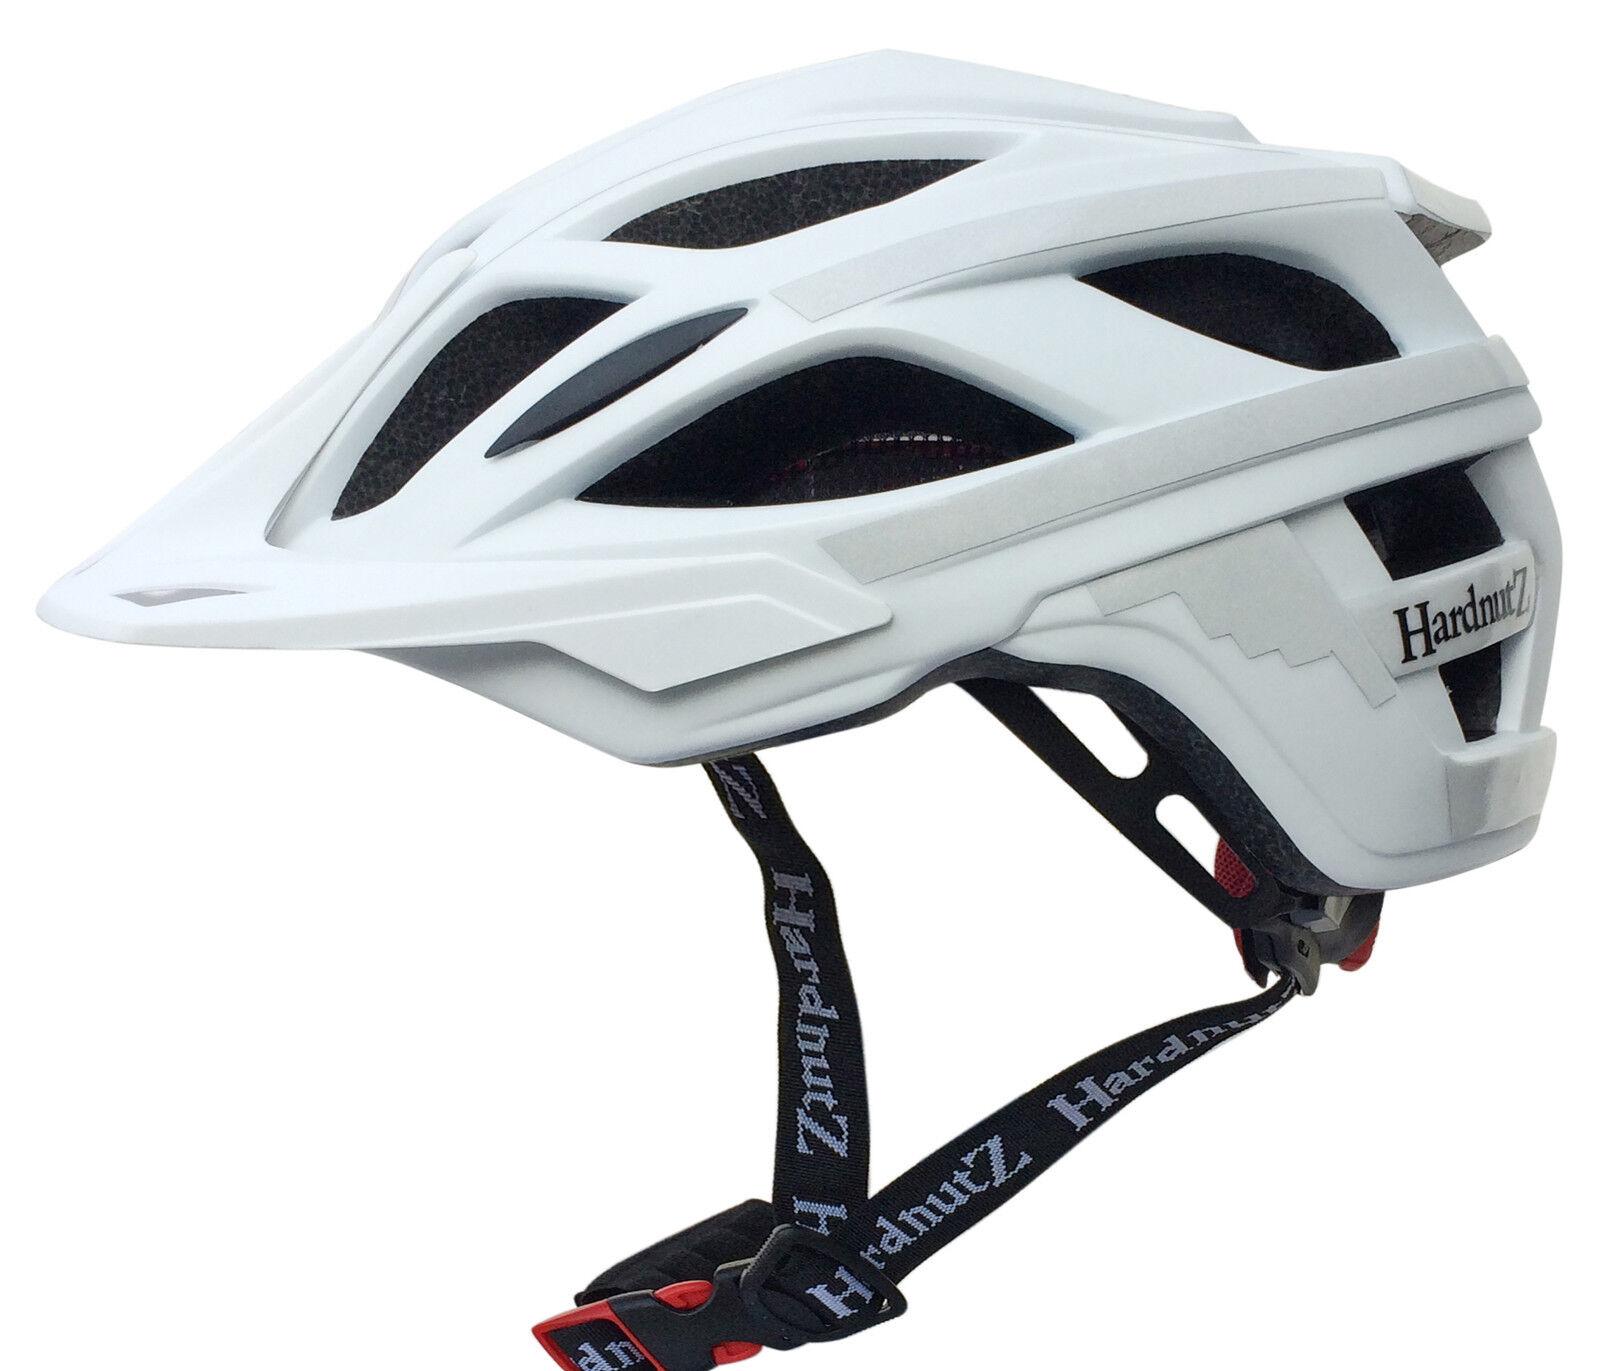 HardnutZ Mountain Bike Helmet MTB Head Predection Hi Vis 3M White Helmet